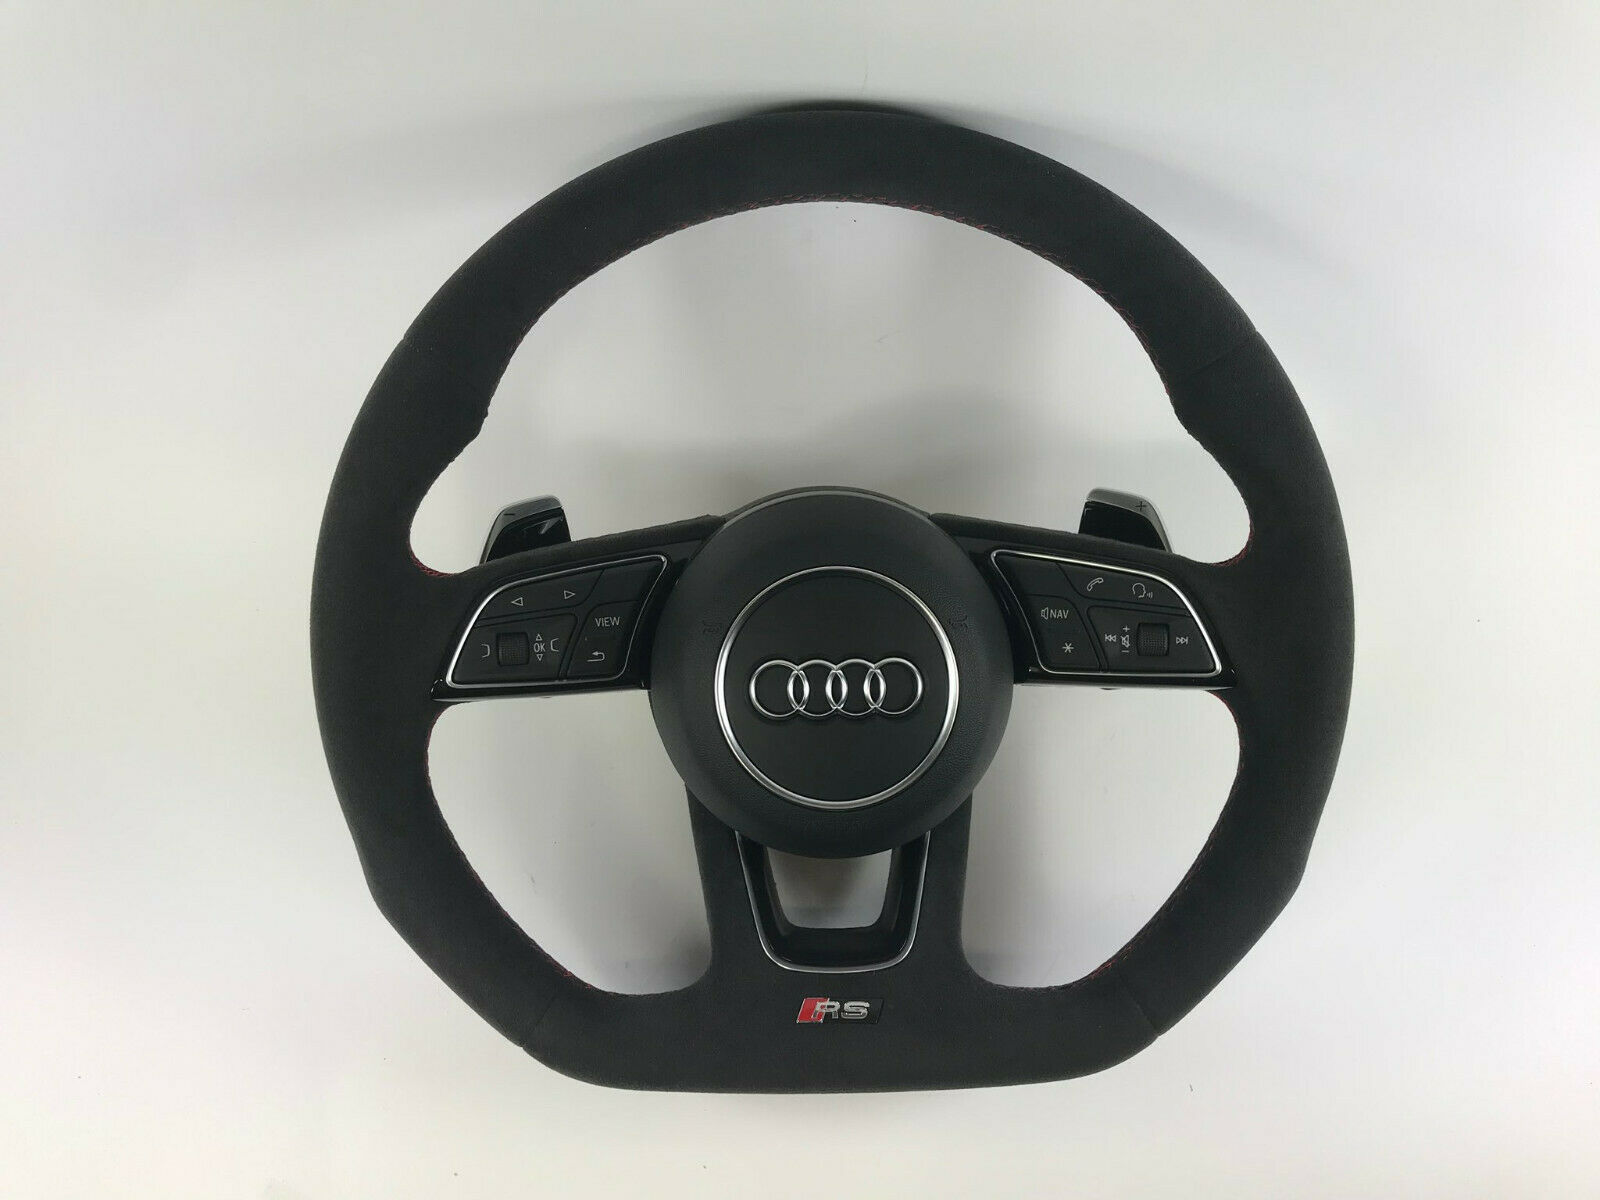 Steering Boot Set Fits Audi A4 quattro A5 A6 A7 A8 Q5 RS4 RS5 RS6 RS7 Febi 45481